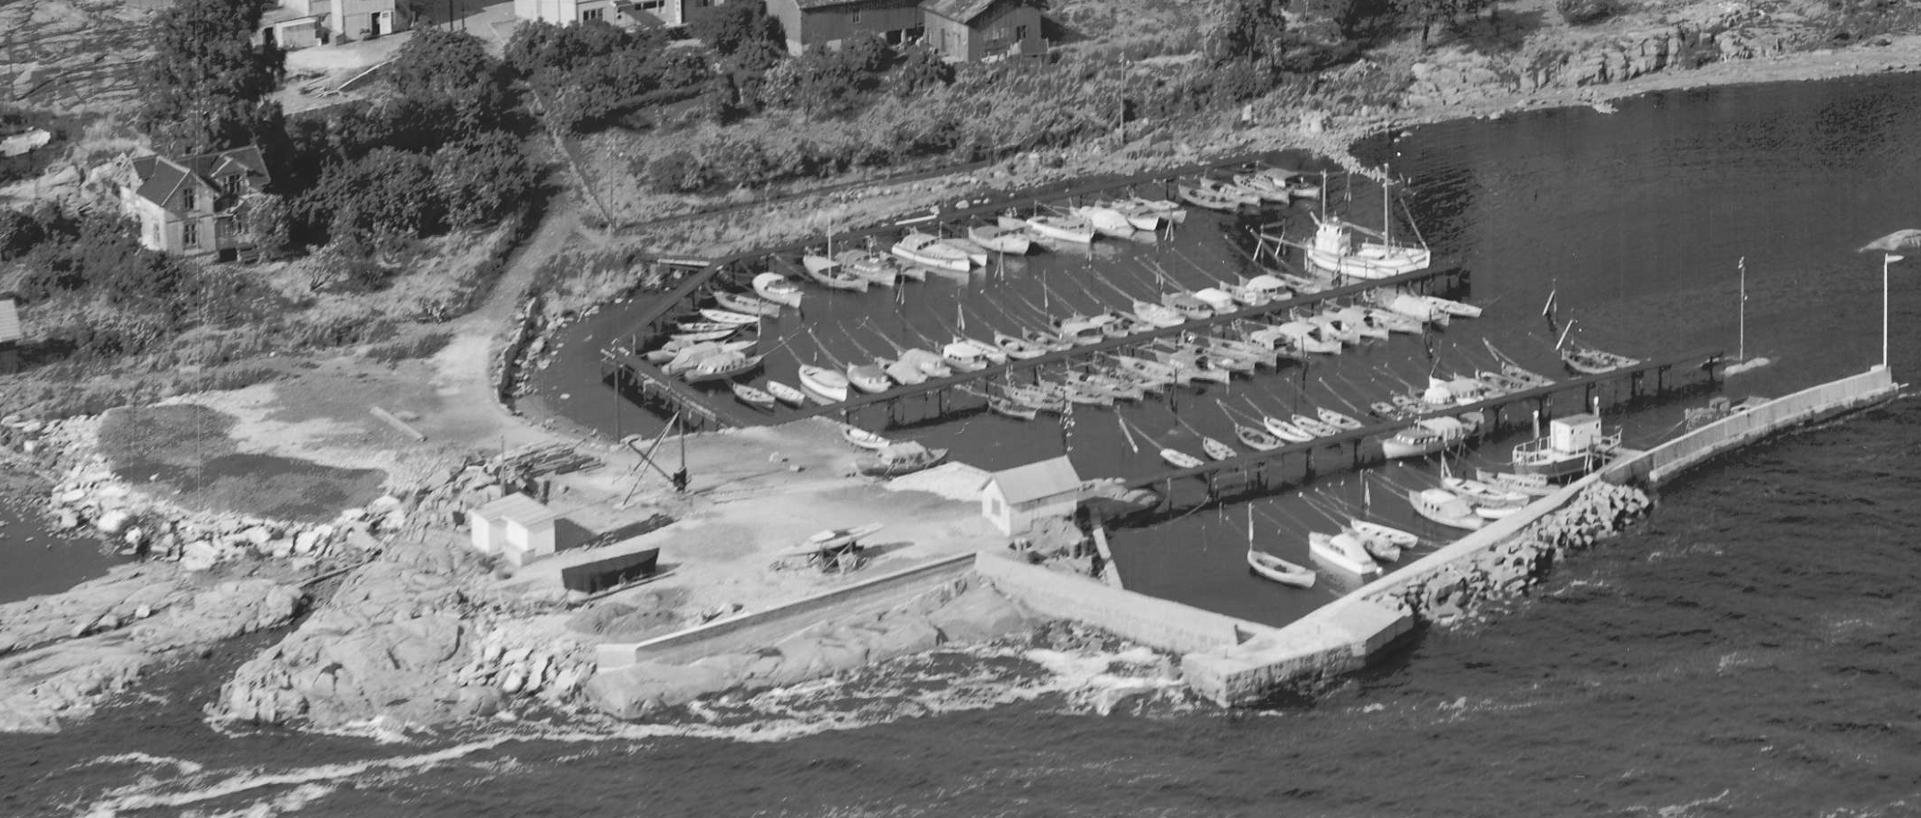 Tofte båthavn 1954B.jpg